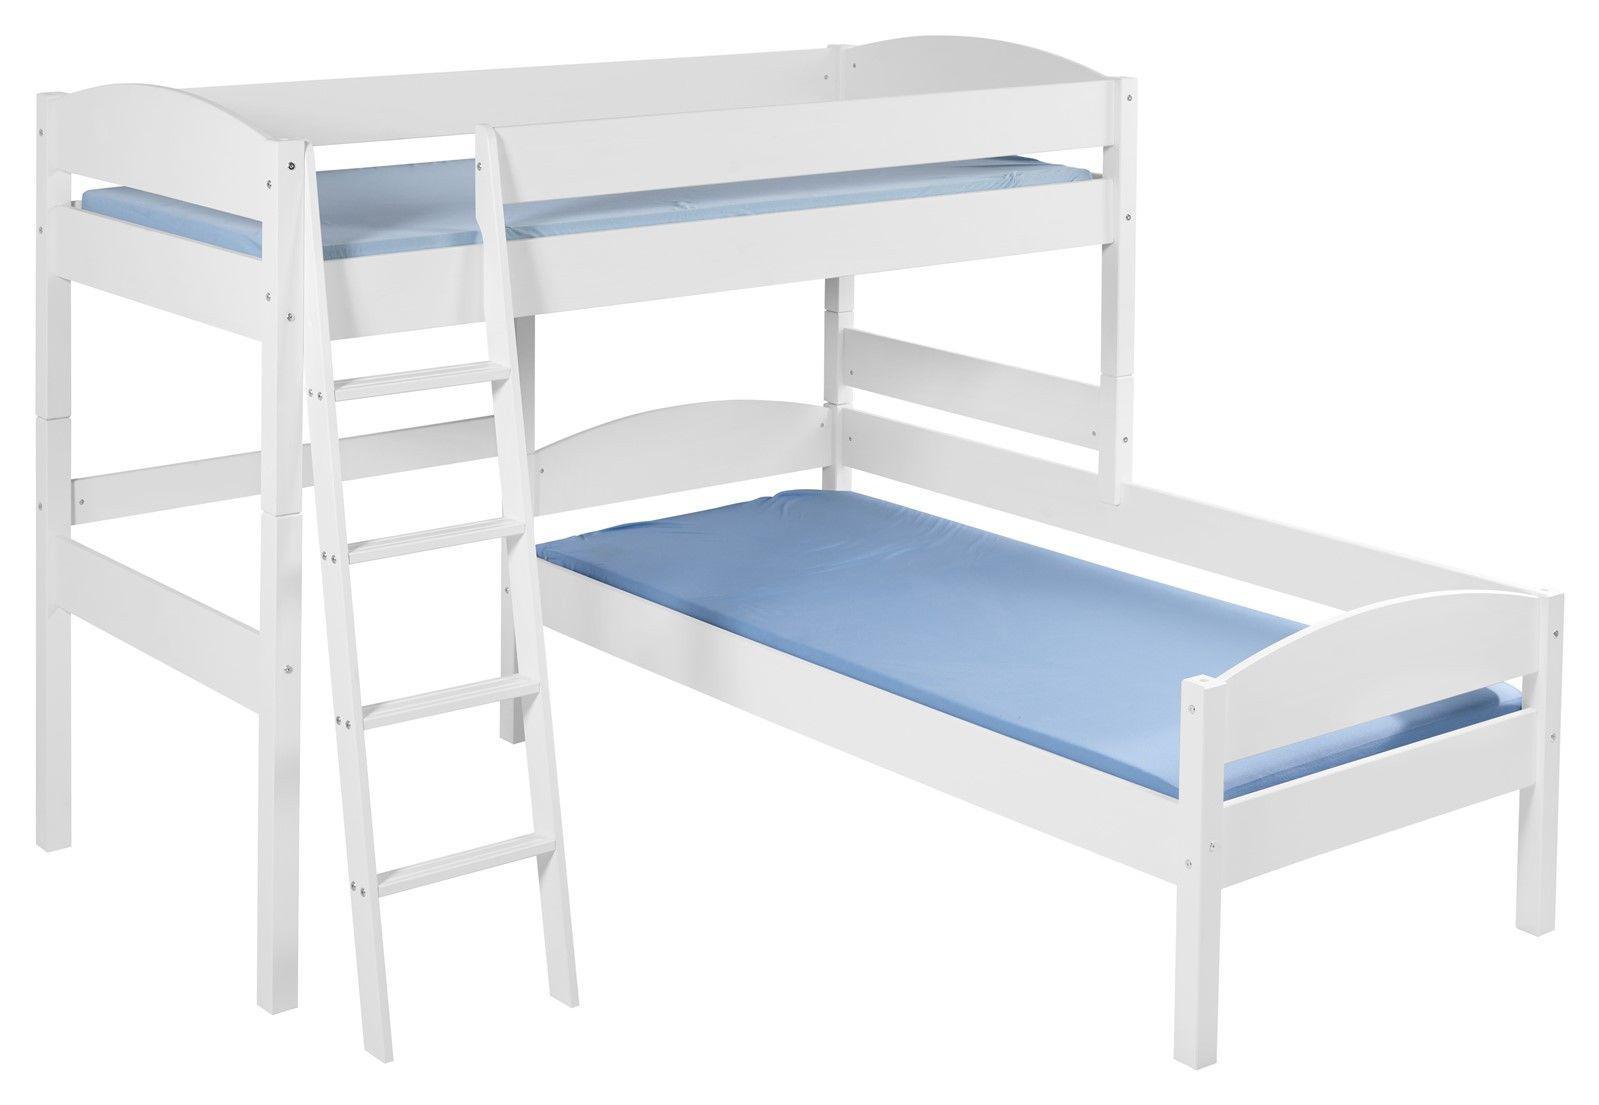 hochbett etagenbett l bett marti kiefer weiss inkl 2 x rollrost kaufen bei sylwia. Black Bedroom Furniture Sets. Home Design Ideas